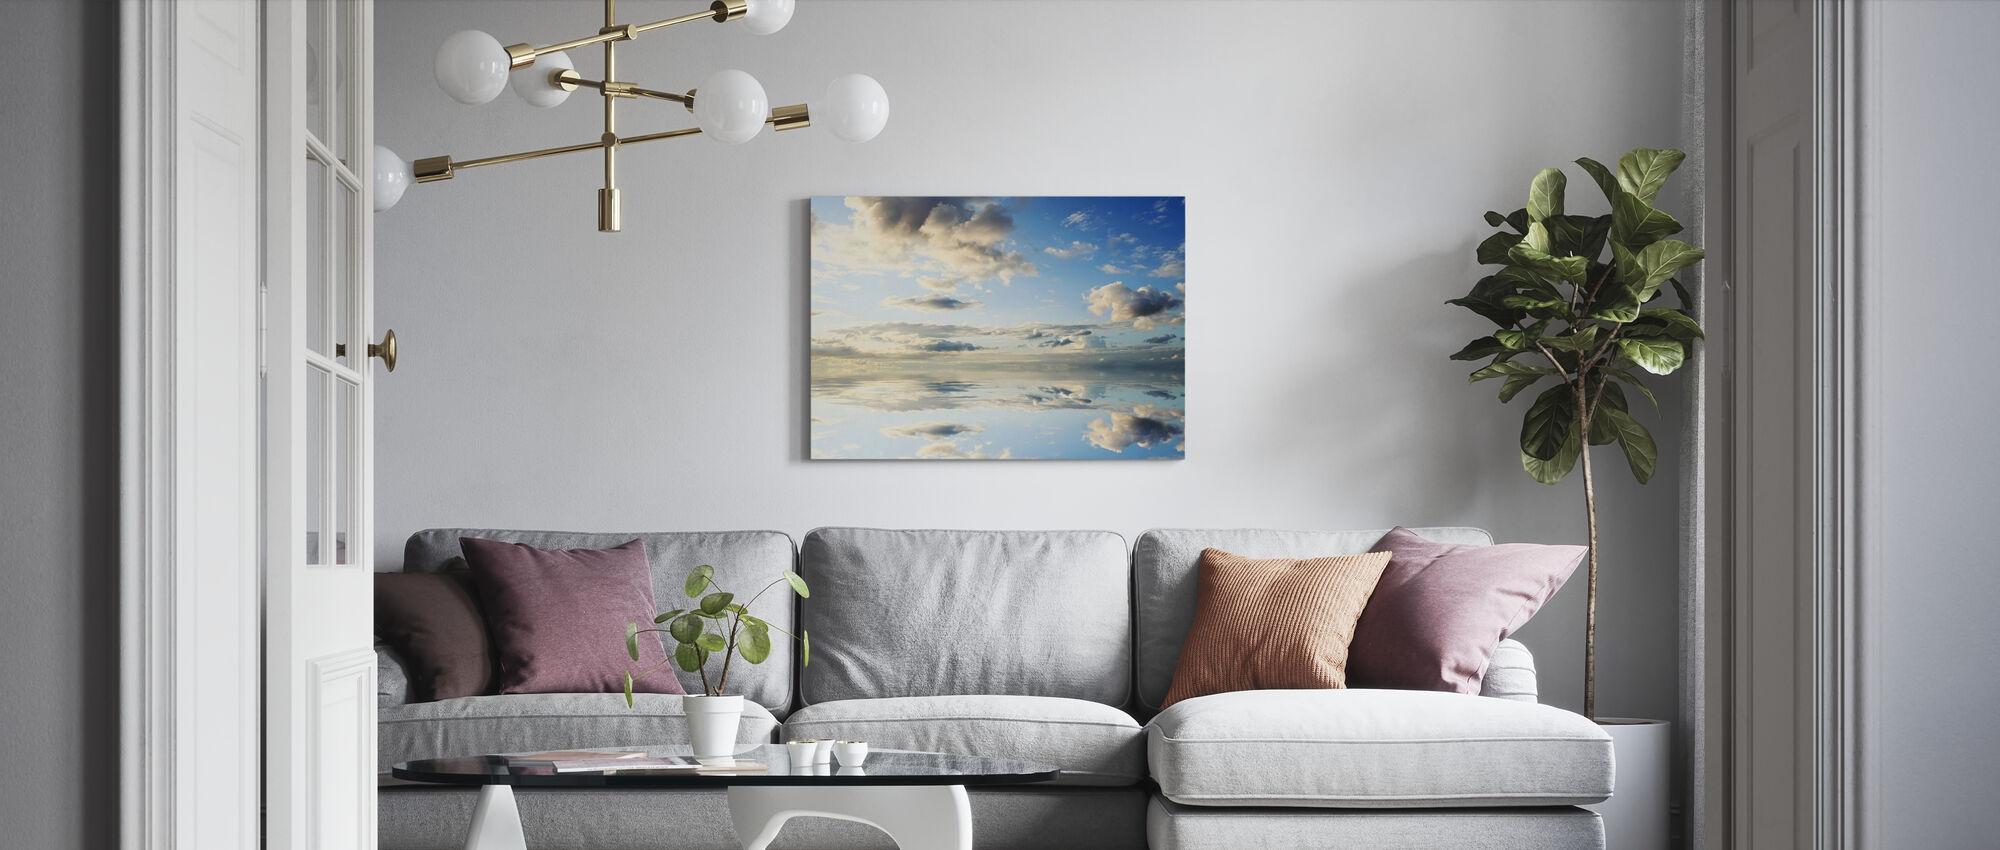 Zee en mooie hemel - Canvas print - Woonkamer